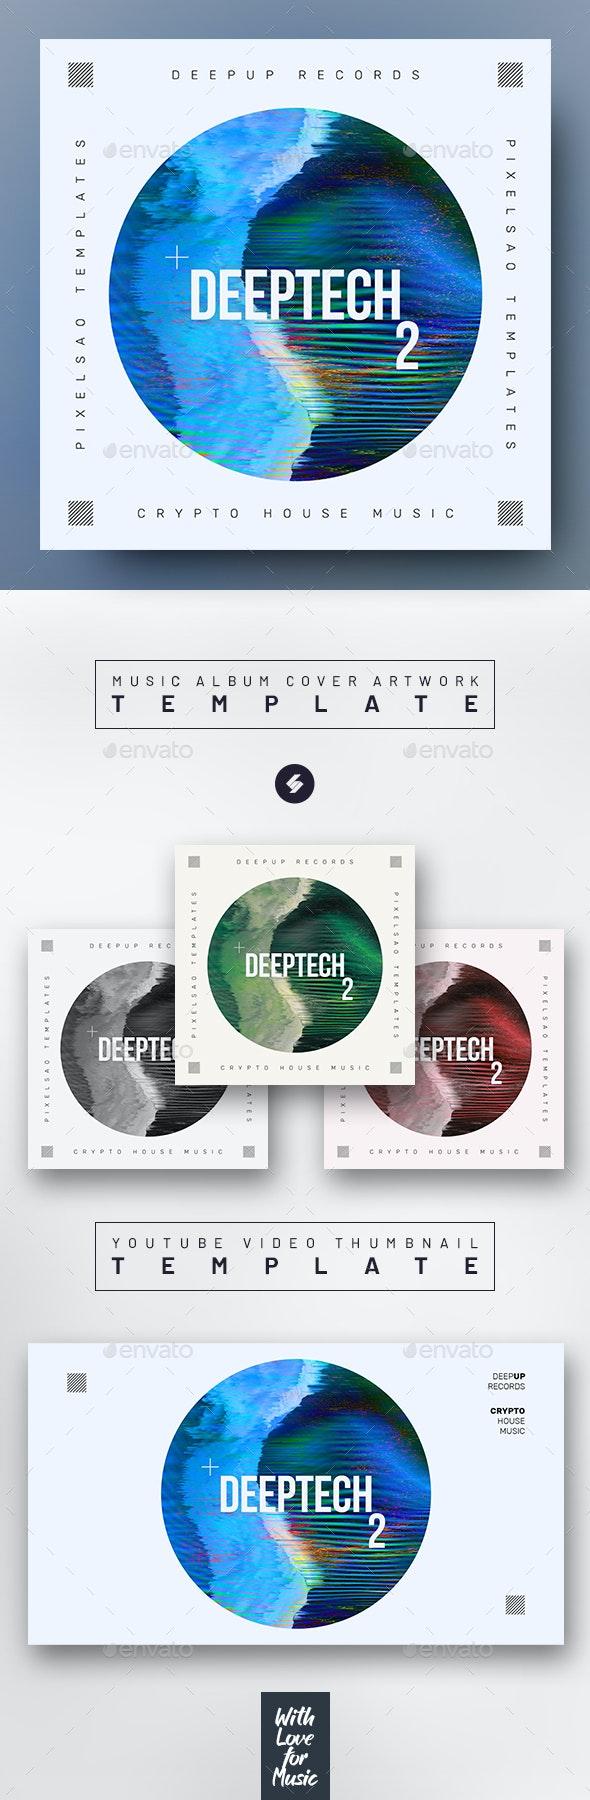 Deep Tech vol.2 – Music Album Cover Artwork Template - Miscellaneous Social Media